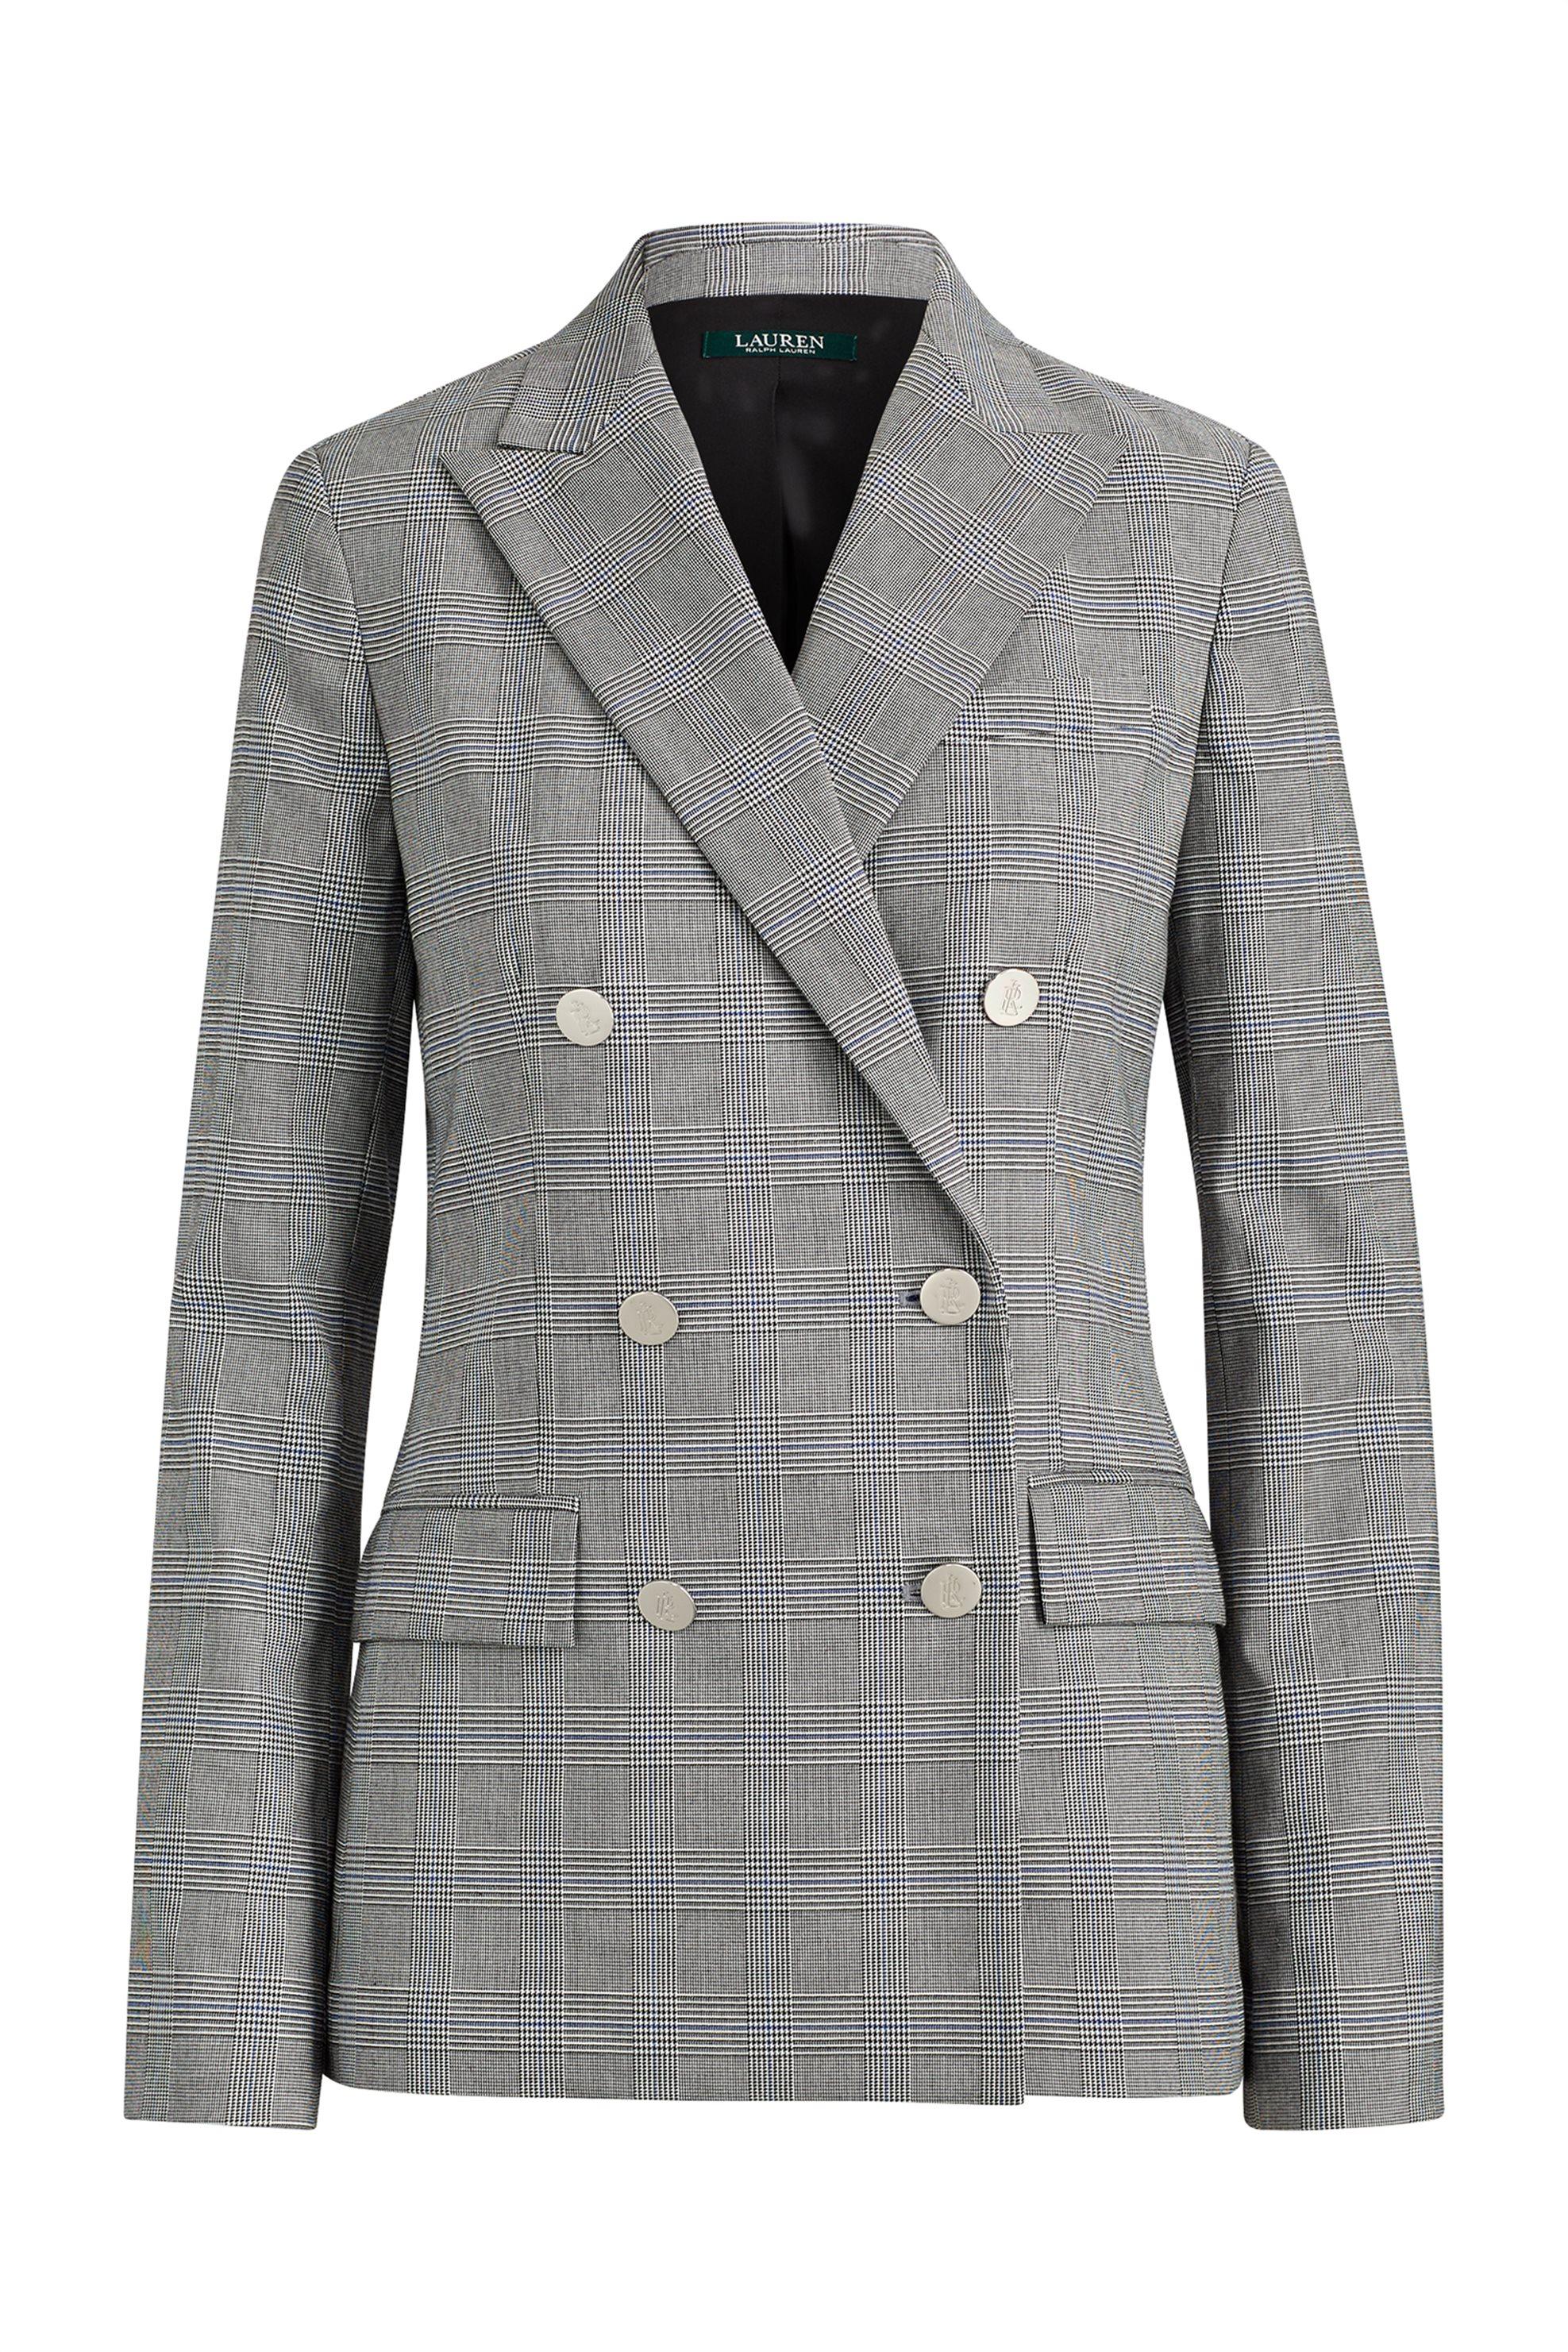 071163d9e74 Lauren Ralph Lauren γυναικείο καρό σακάκι Double-Breasted - 200726123001 -  Γκρι